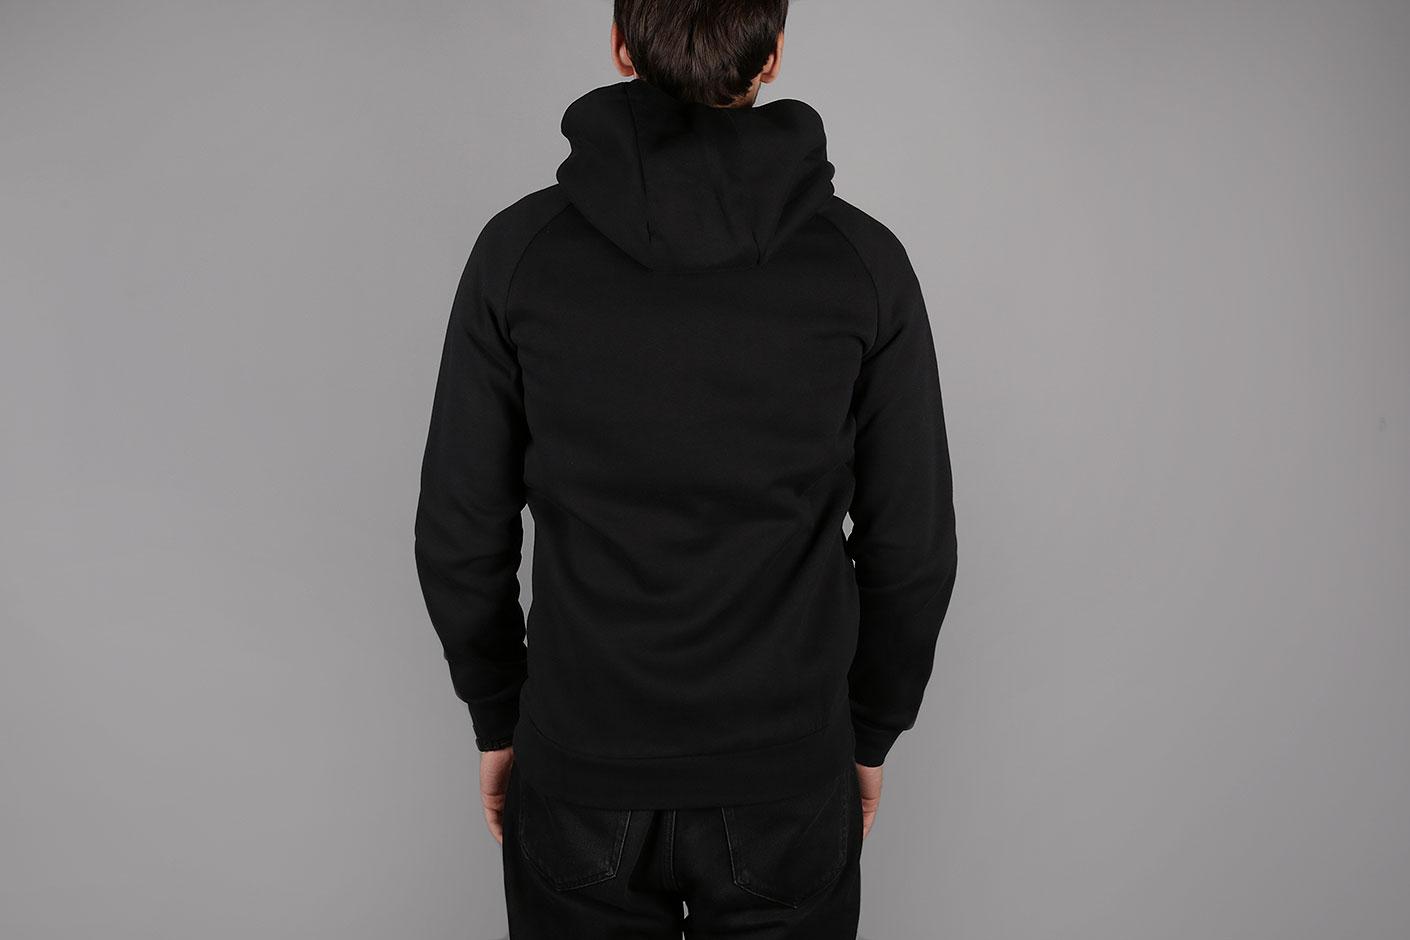 ... Мужская черная толстовка Jordan Jumpman Air Men s Fleece Full-Zip  Hoodie - фото 4 картинки 8b34754db74